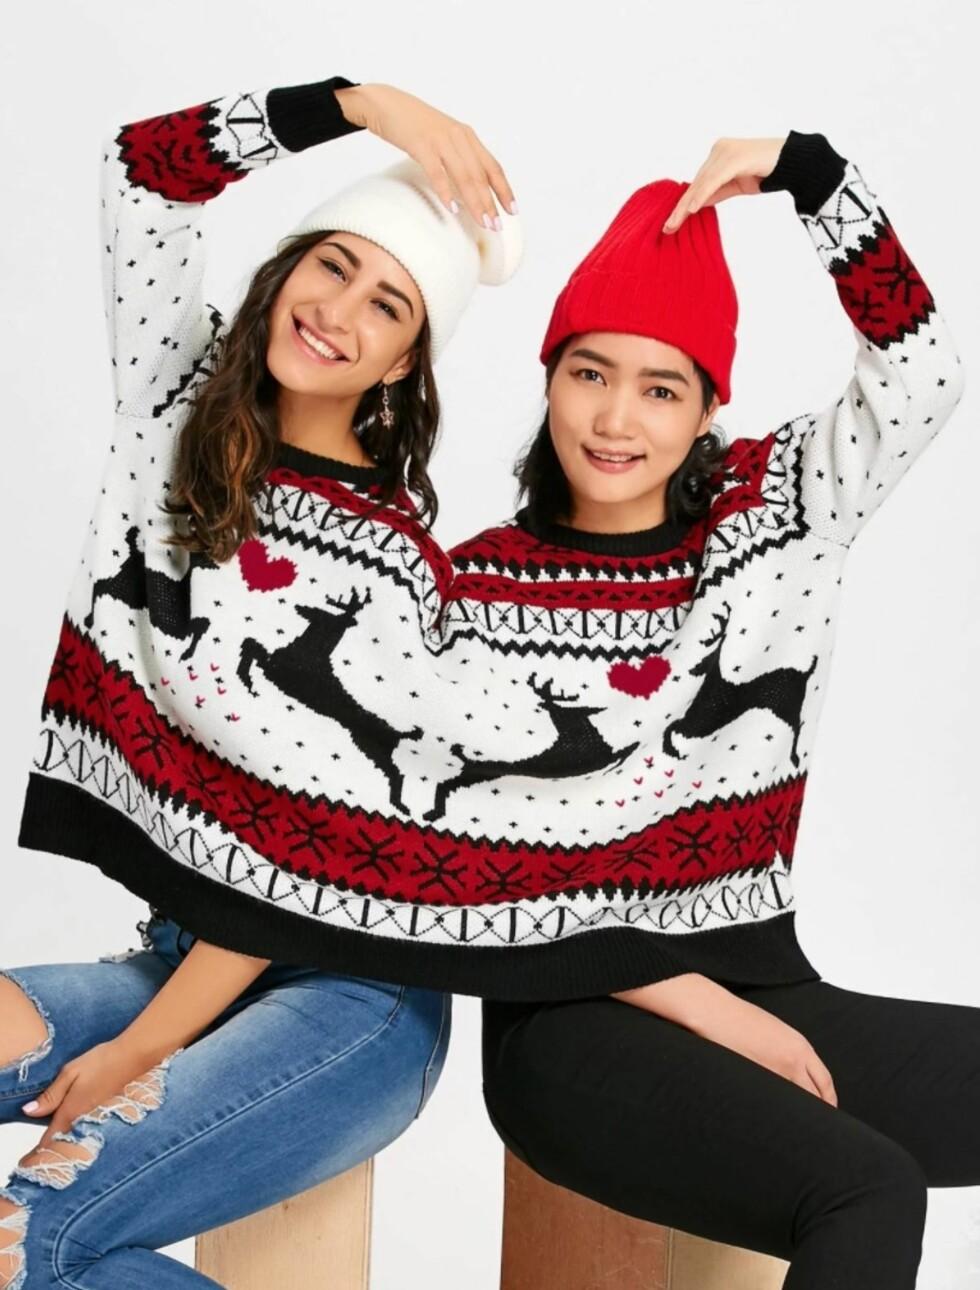 Genser via Rosegal |254,-| https://www.rosegal.com/sweaters/reindeer-two-person-christmas-sweater-1517912.html